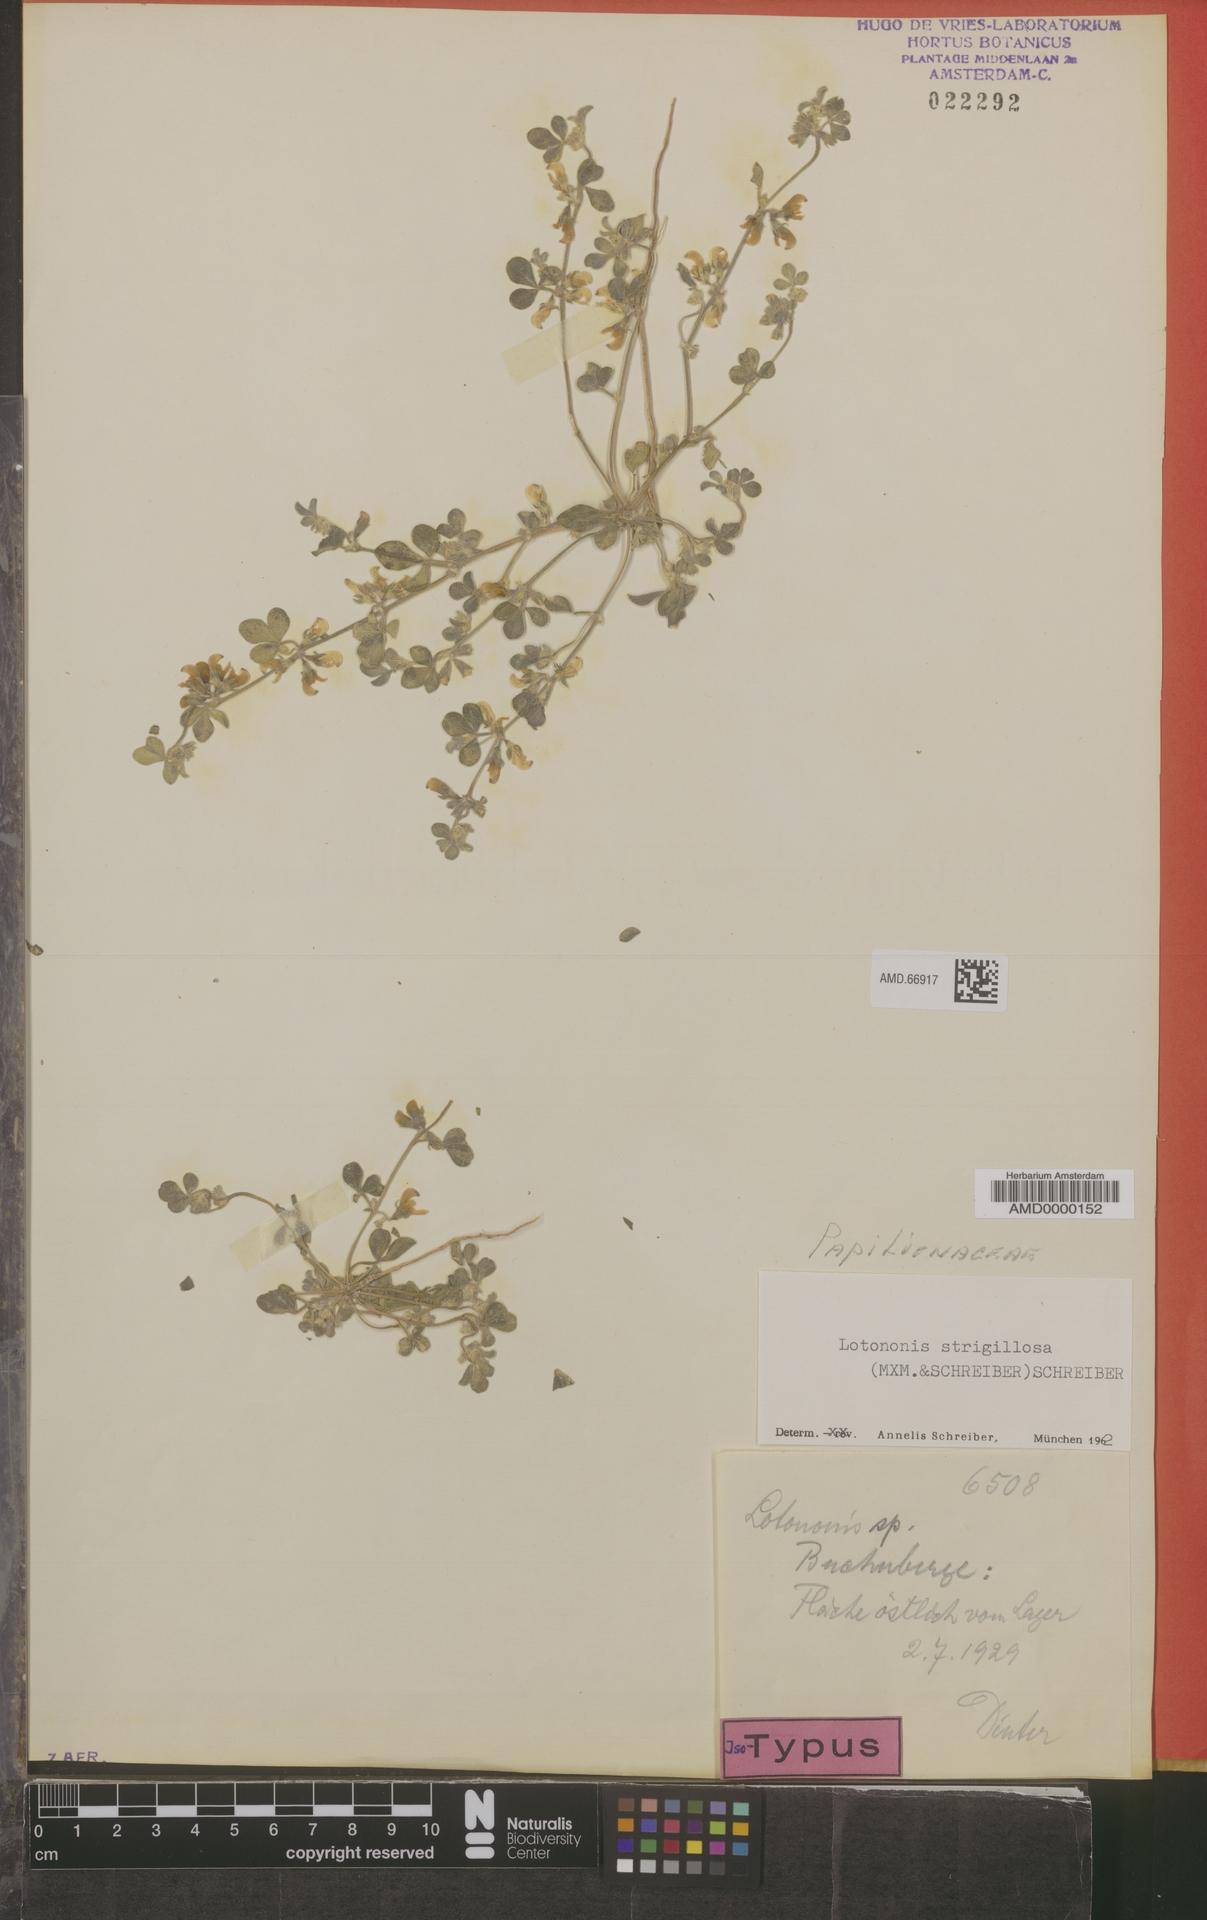 AMD.66917 | Lotononis strigillosa (Merxm. & A.Schreib.) A.Schreib.